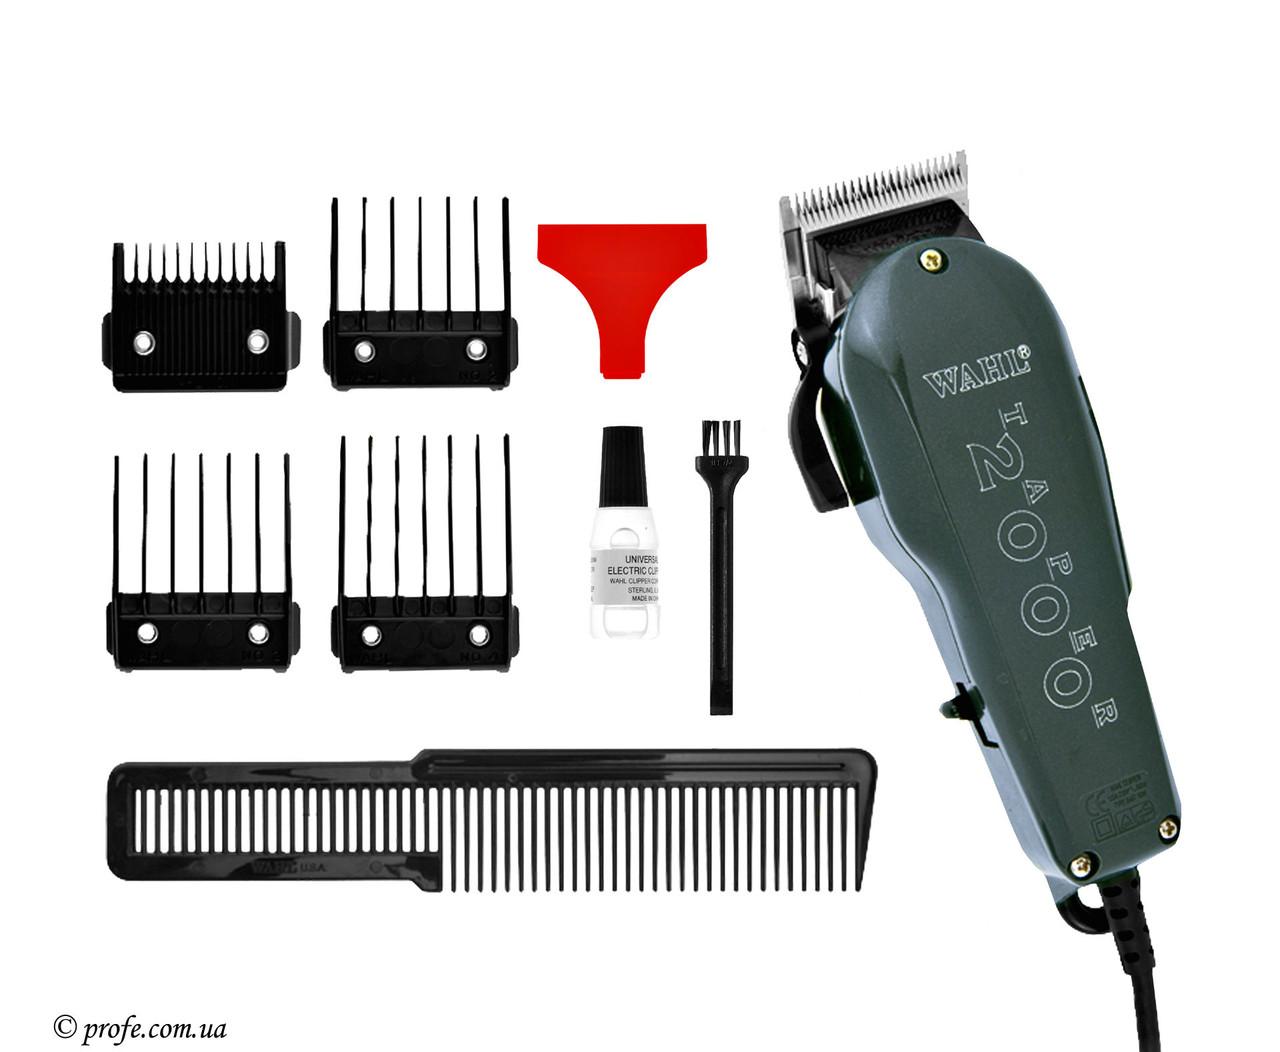 Машинка для стрижки волос WAHL Taper 2000